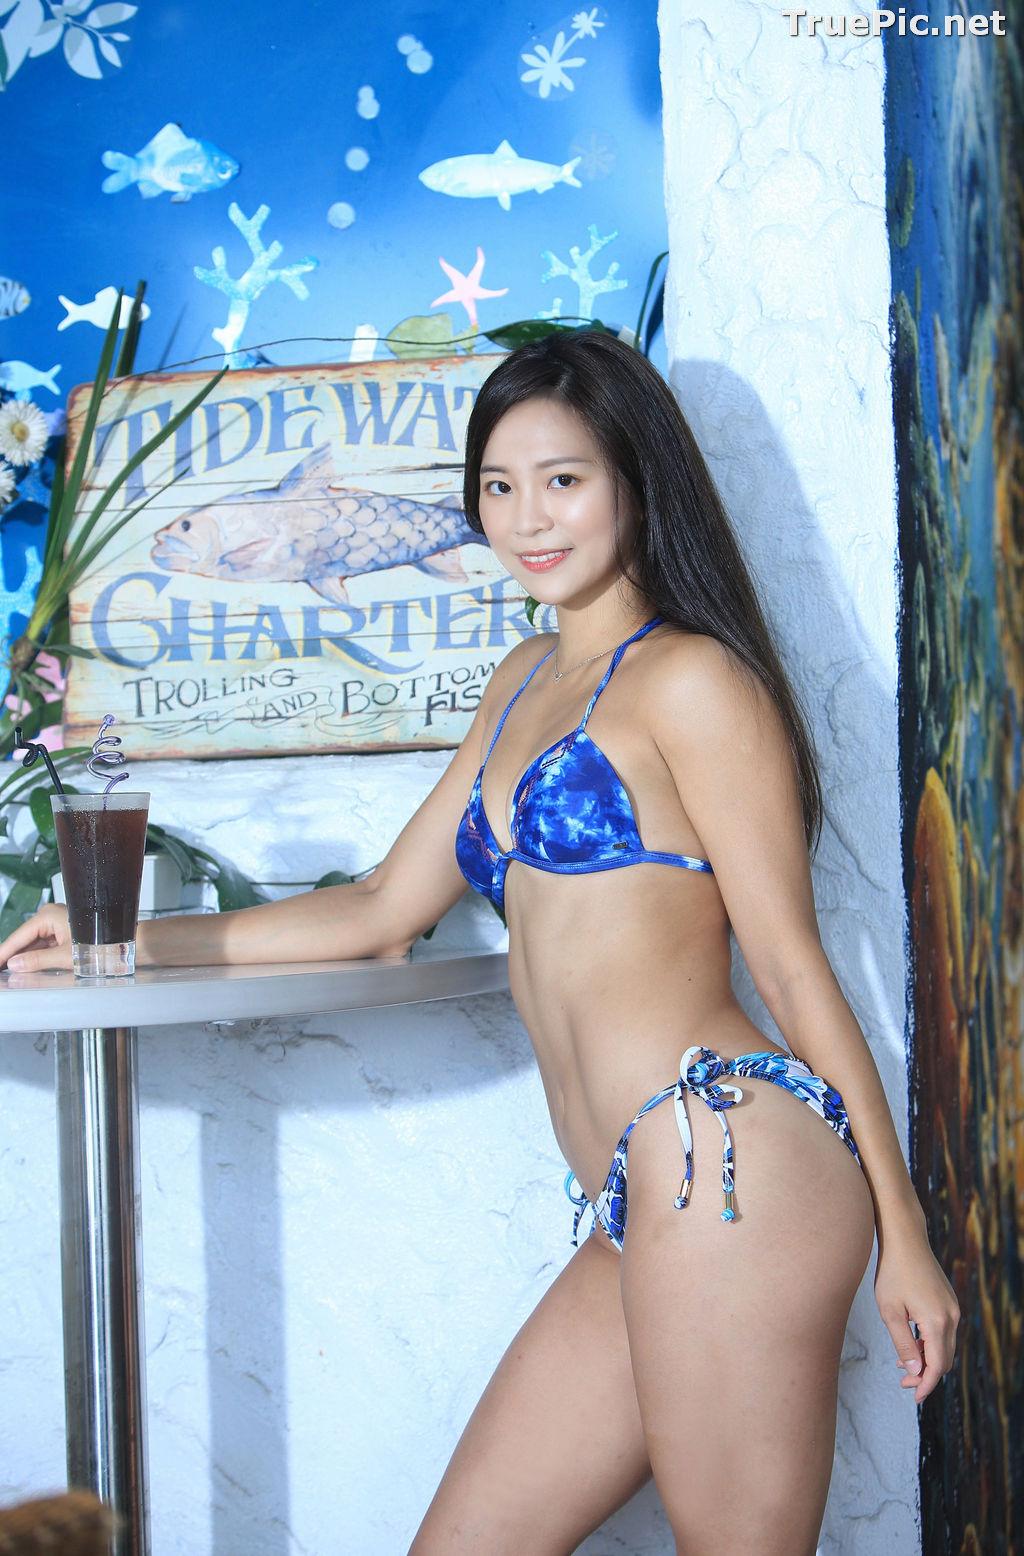 Image Taiwanese Model - Shelly - Beautiful Bodybuilding Bikini Girl - TruePic.net - Picture-50